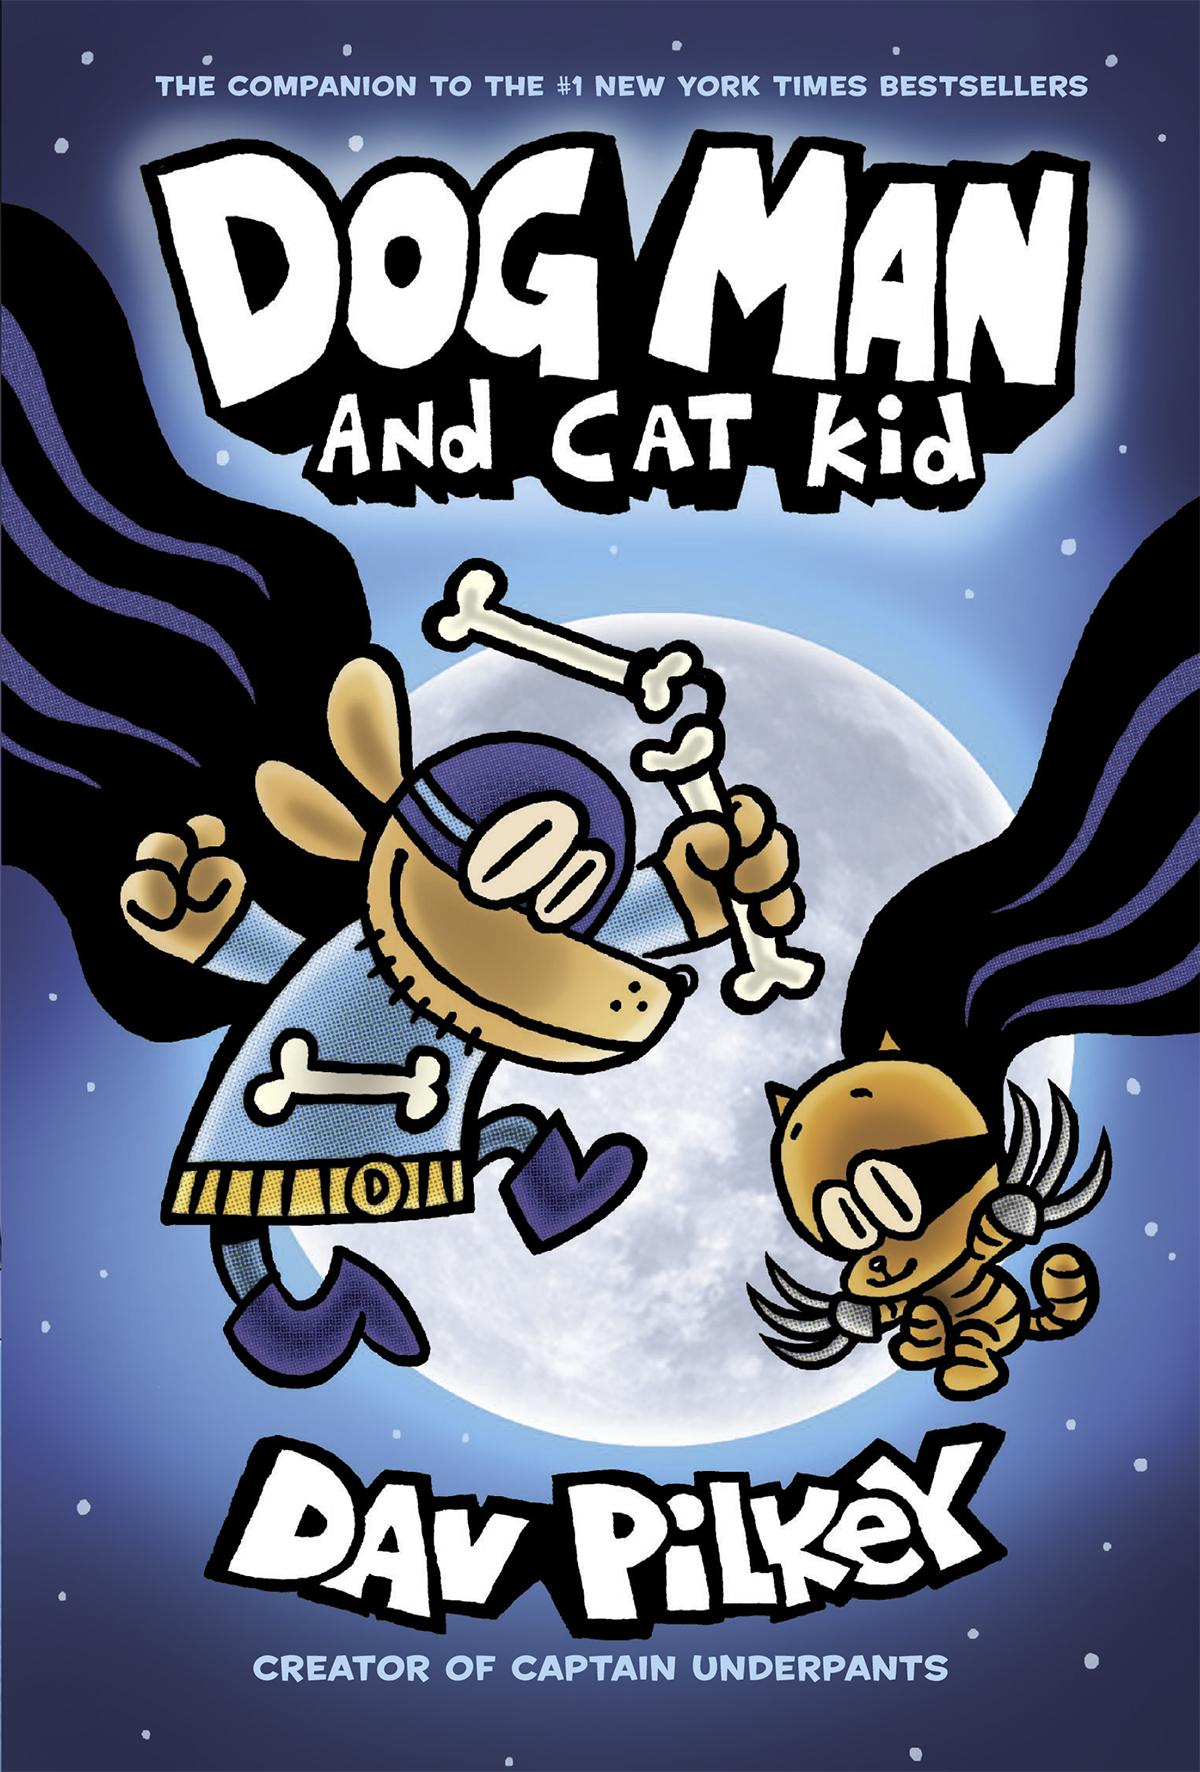 dfd8a3dc15b DOG MAN#4: DOG MAN AND CAT KID